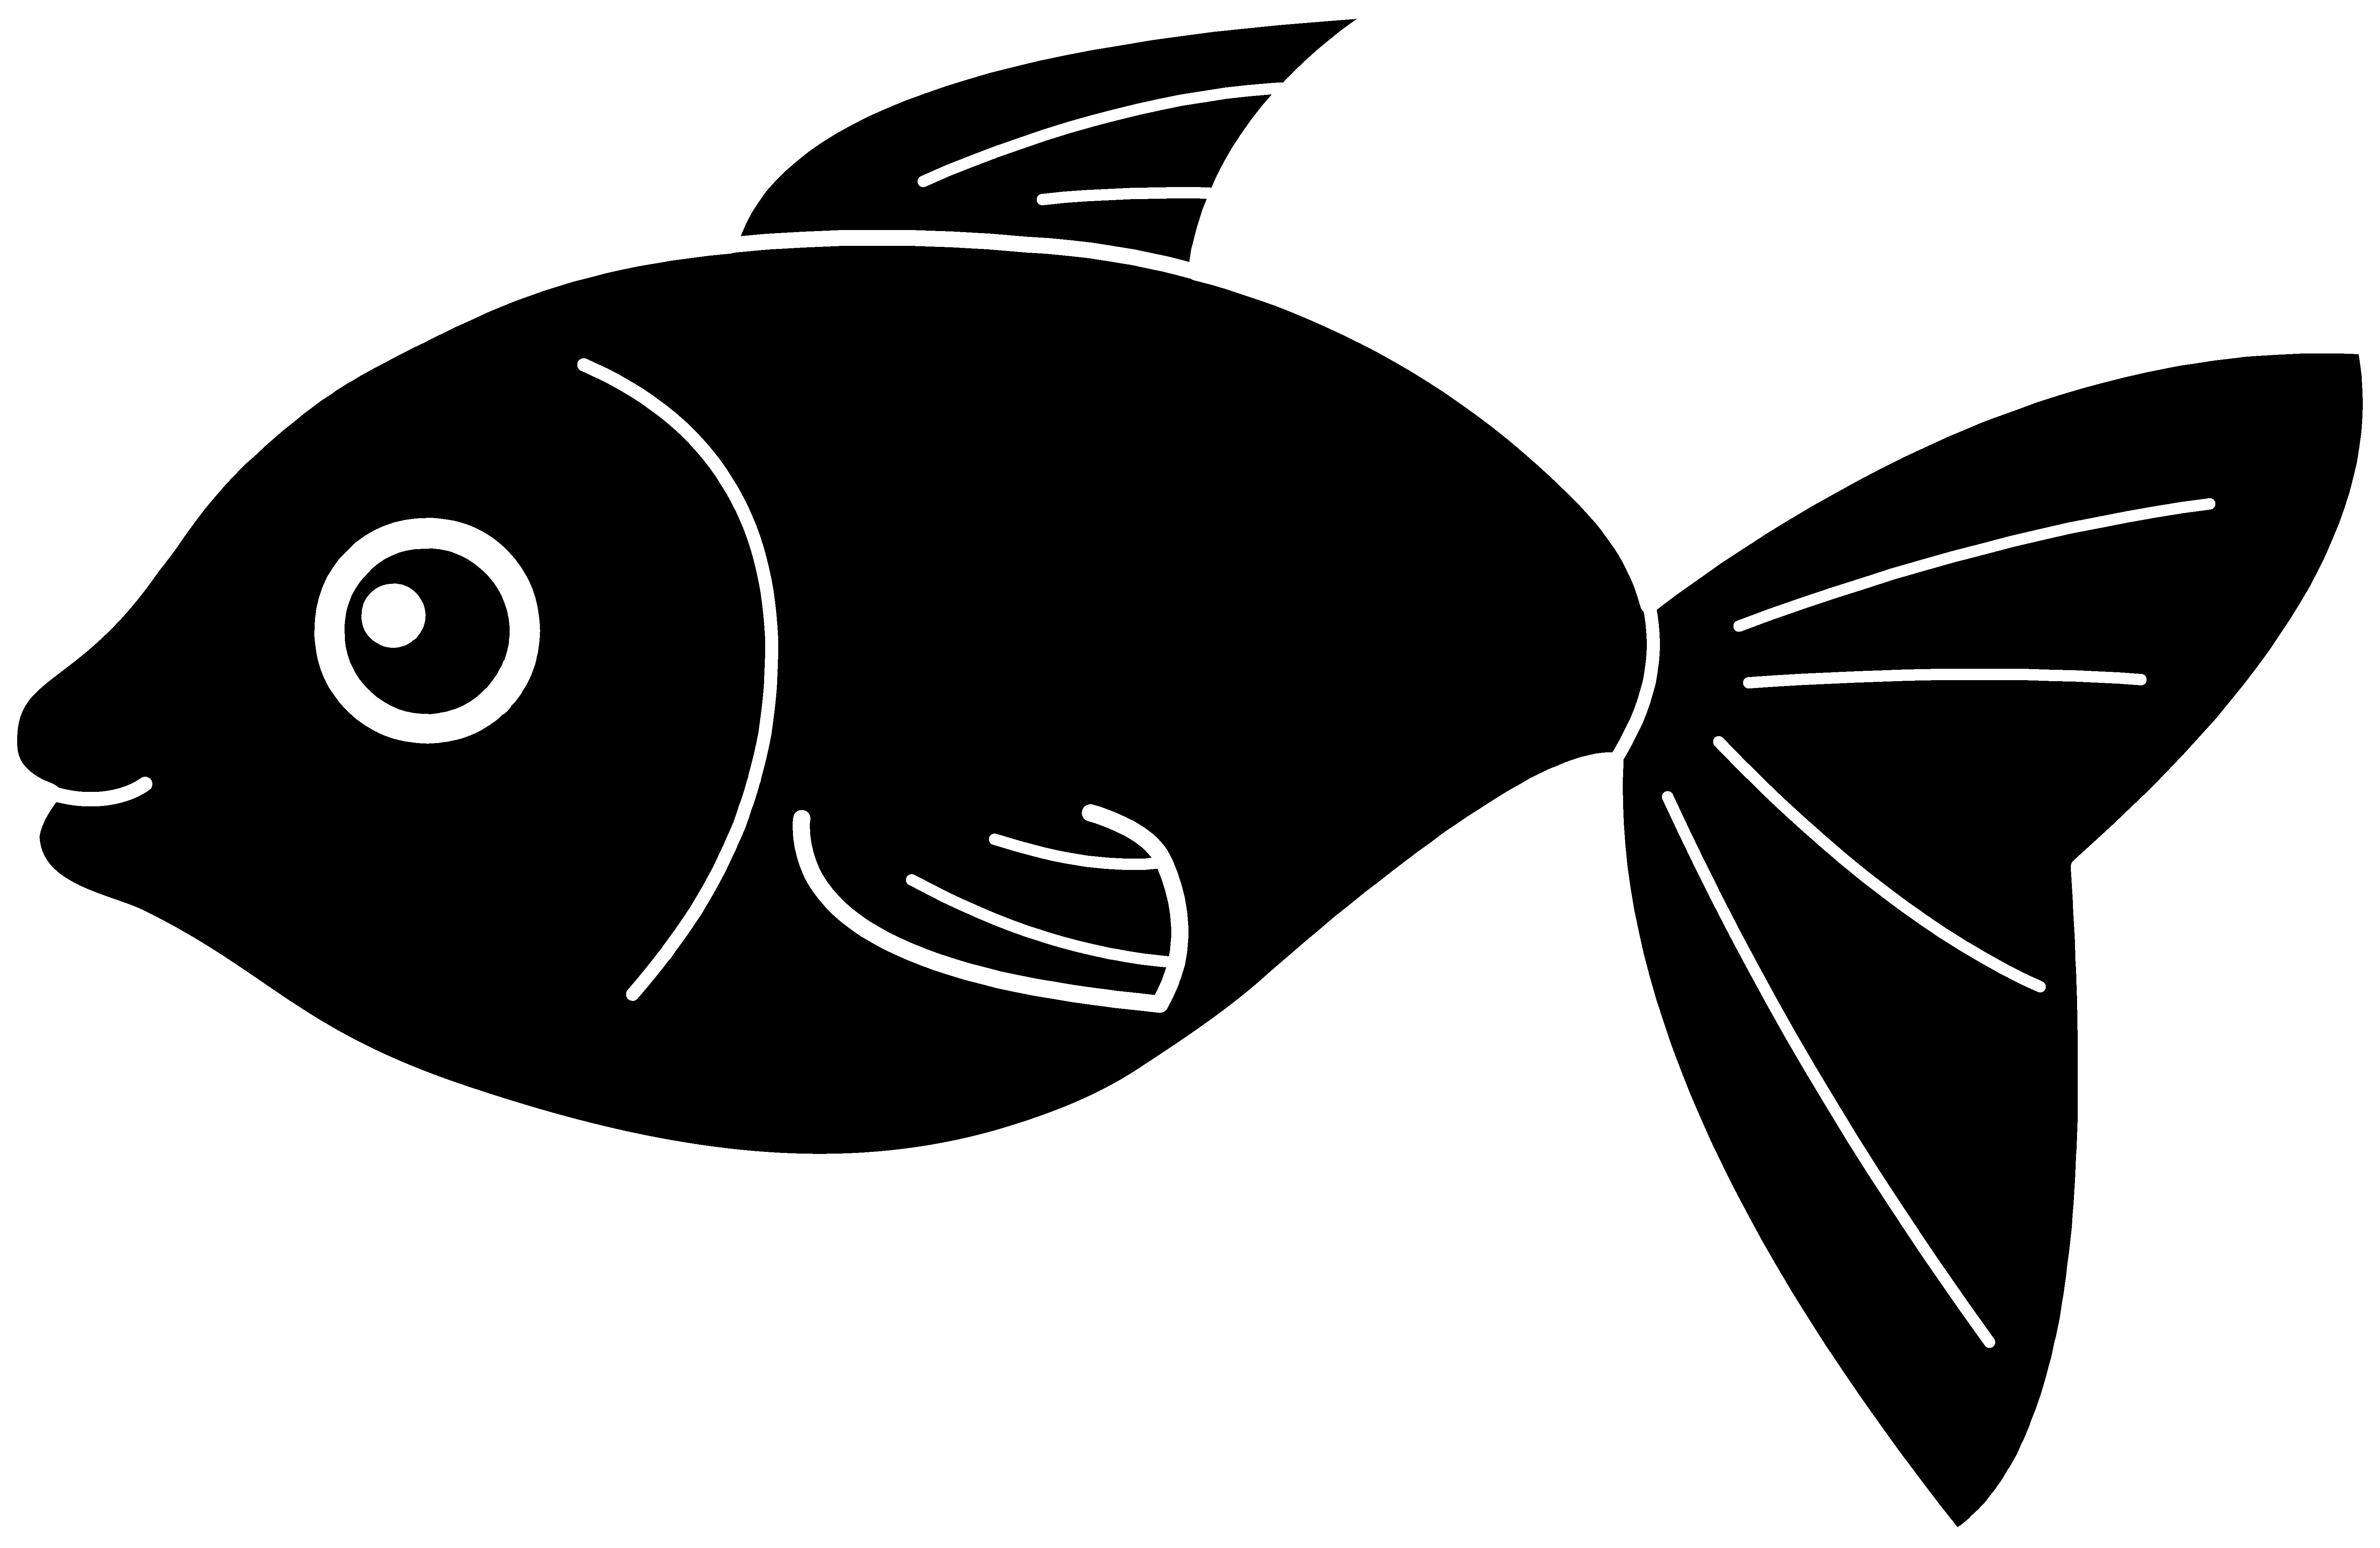 Cartoon fish clipart black and white transparent background clip free Fish Clip Art Black and White | Black Fish Silhouette | pattern ... clip free